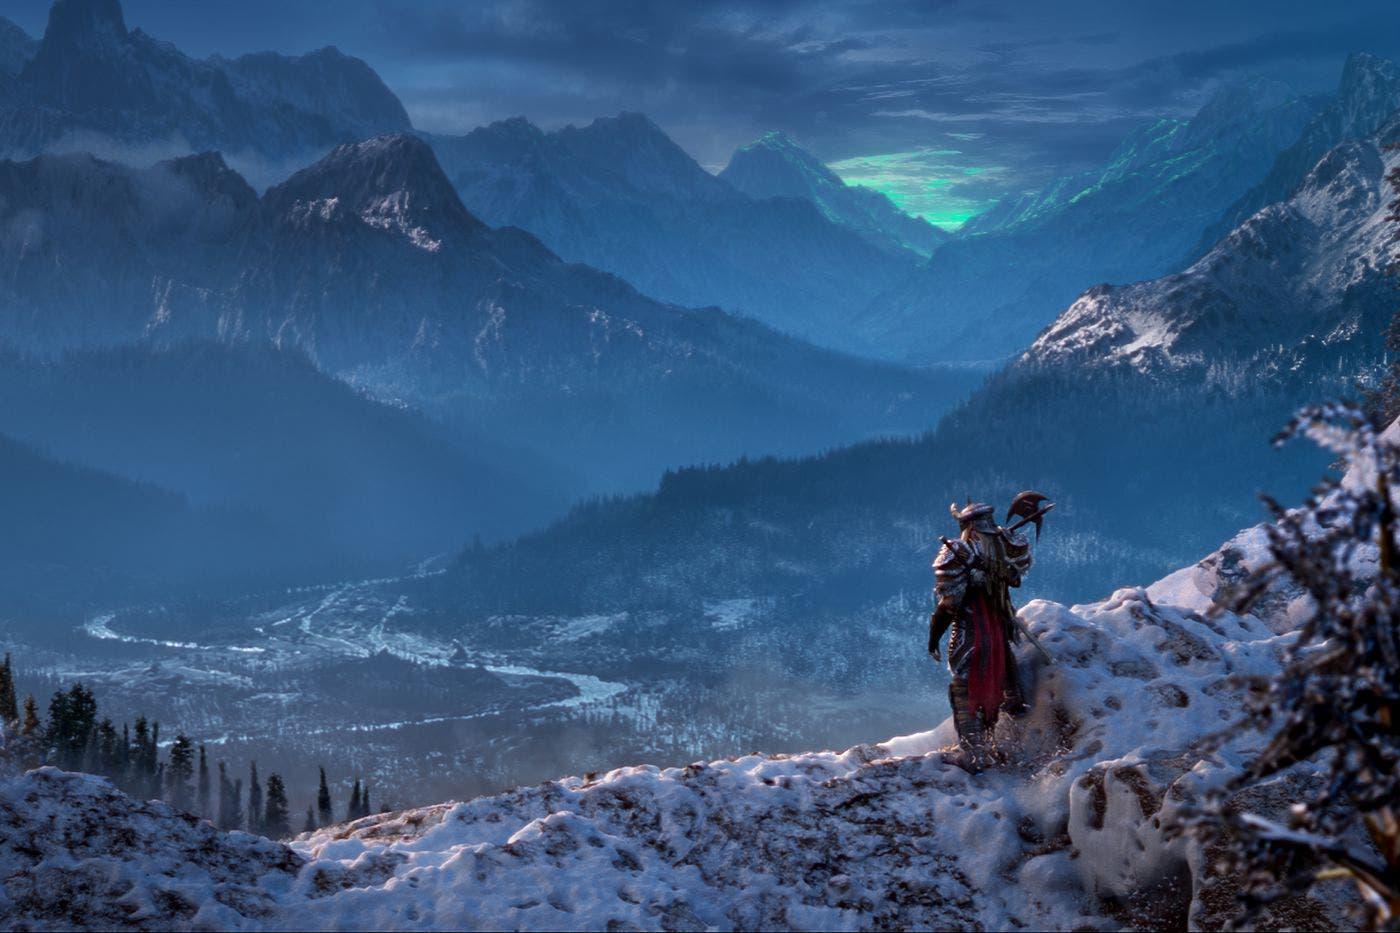 The Elder Scrolls Online continúa la senda hacia The Elder Scrolls VI 8